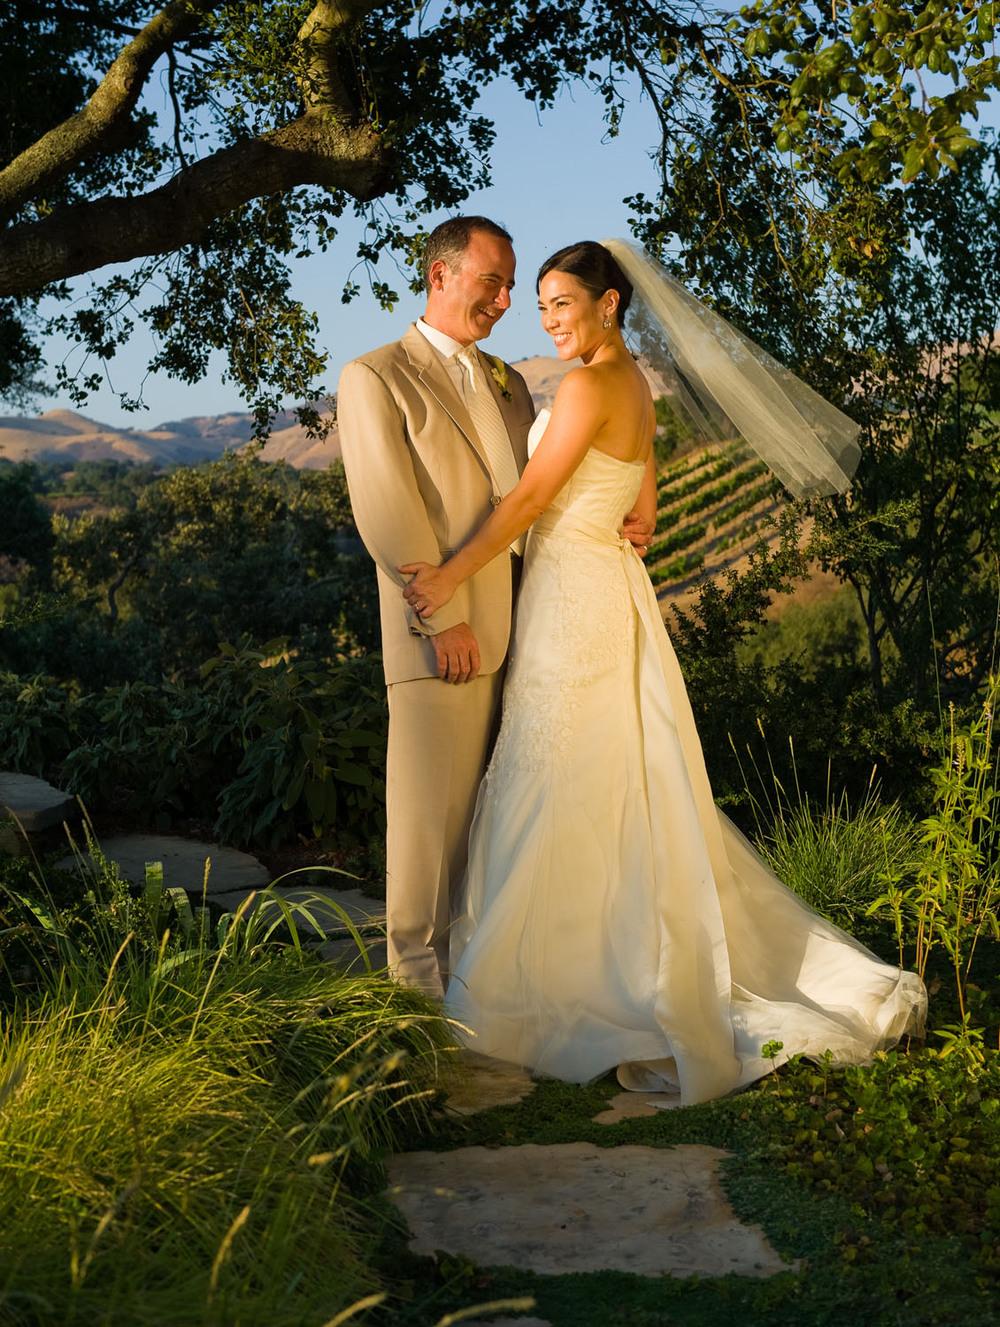 stewart_bertrand_weddings_whp2-1042.jpg